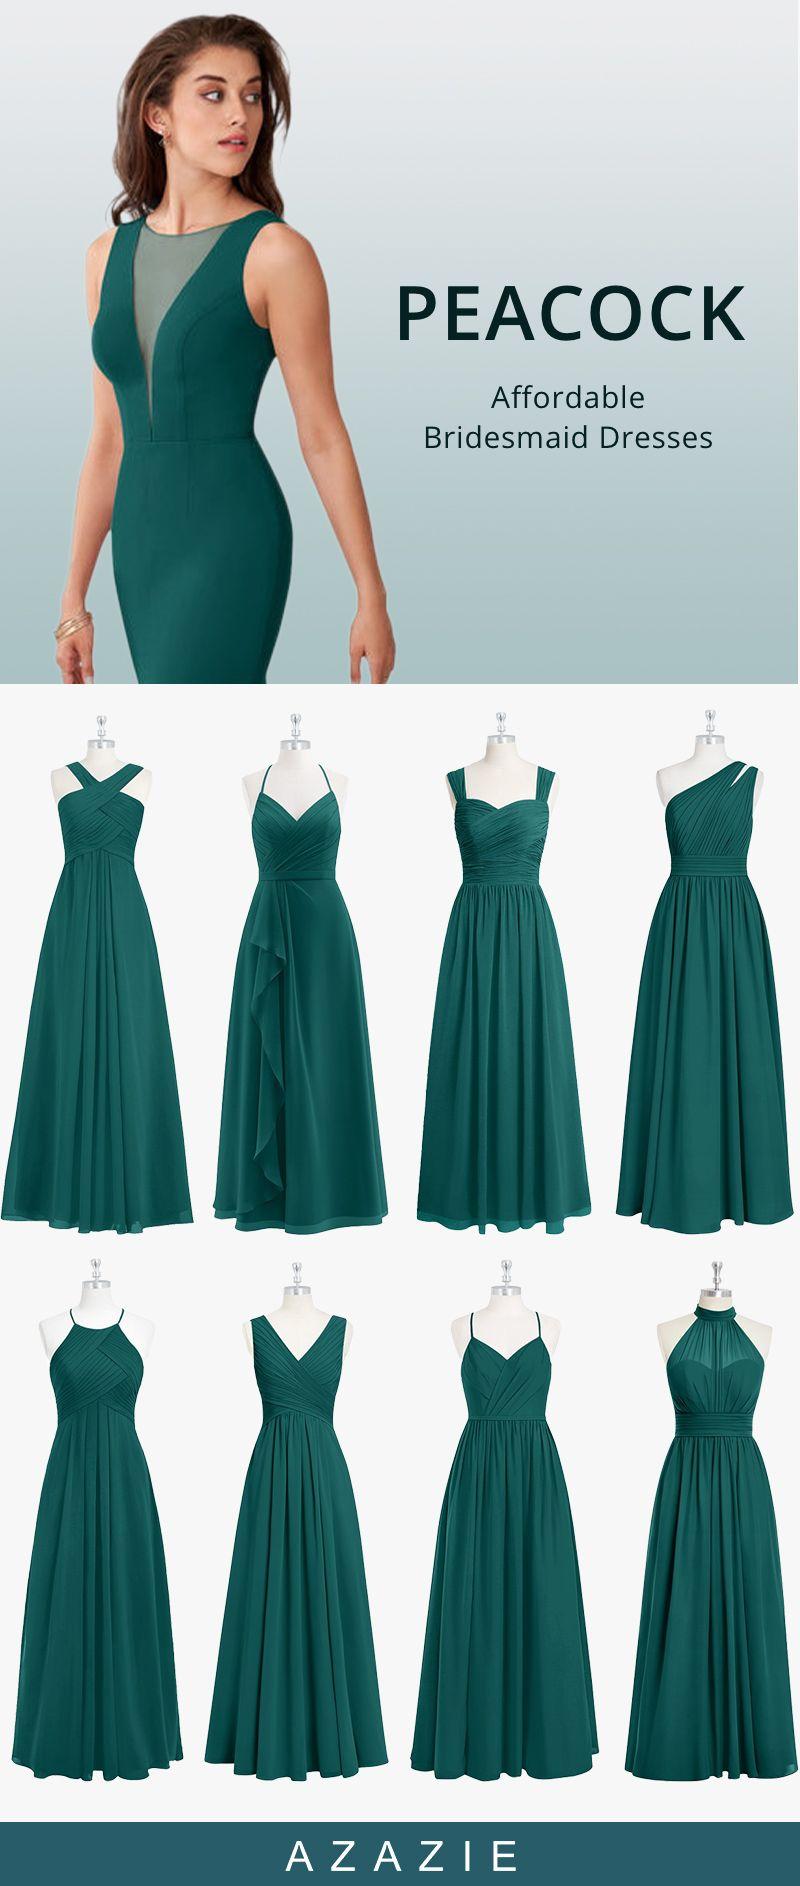 Peacock Bridesmaid Dresses At Affordable Prices In 2020 Peacock Bridesmaid Dresses Bridesmaid Dresses Burgundy Bridesmaid Dresses